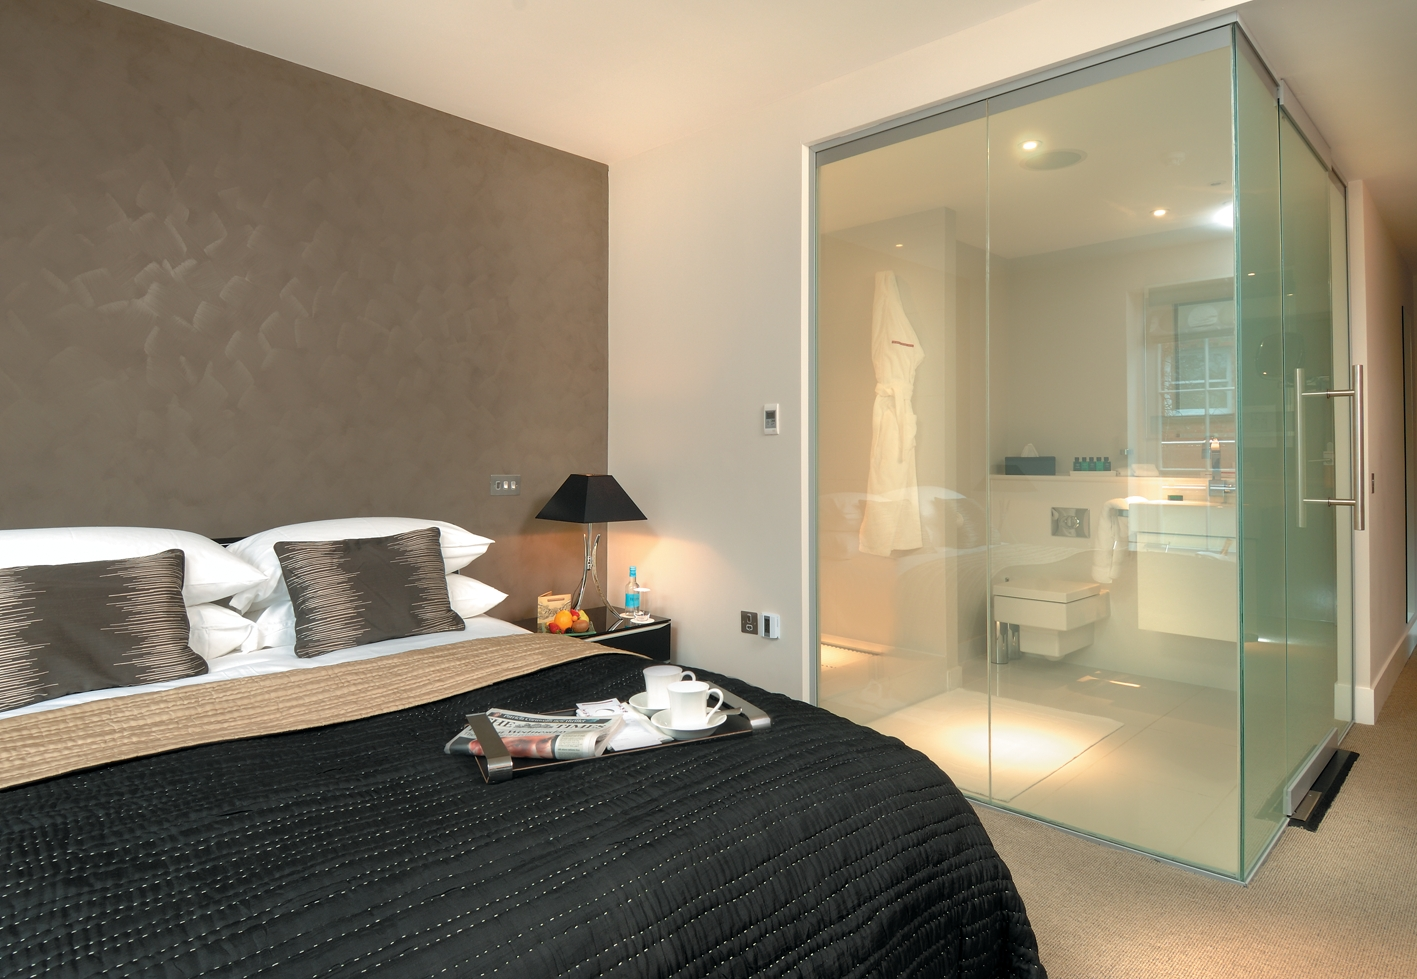 """Peek a boo"" LC SmartGlass for Hotel Bathroom Interiors"